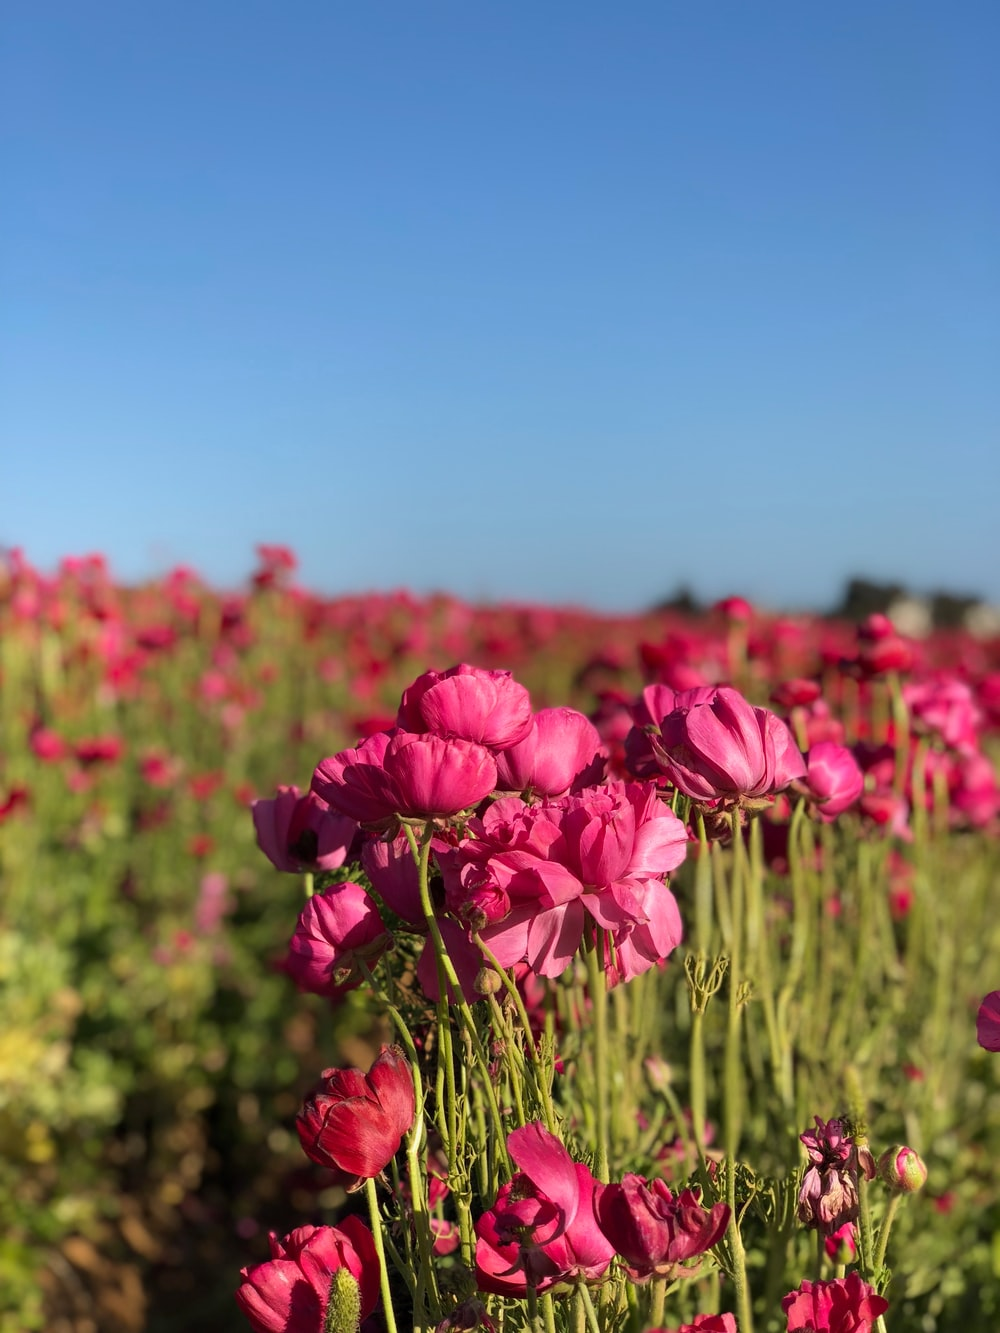 Woman in flower field pictures download free images on unsplash pink peony flower field mightylinksfo